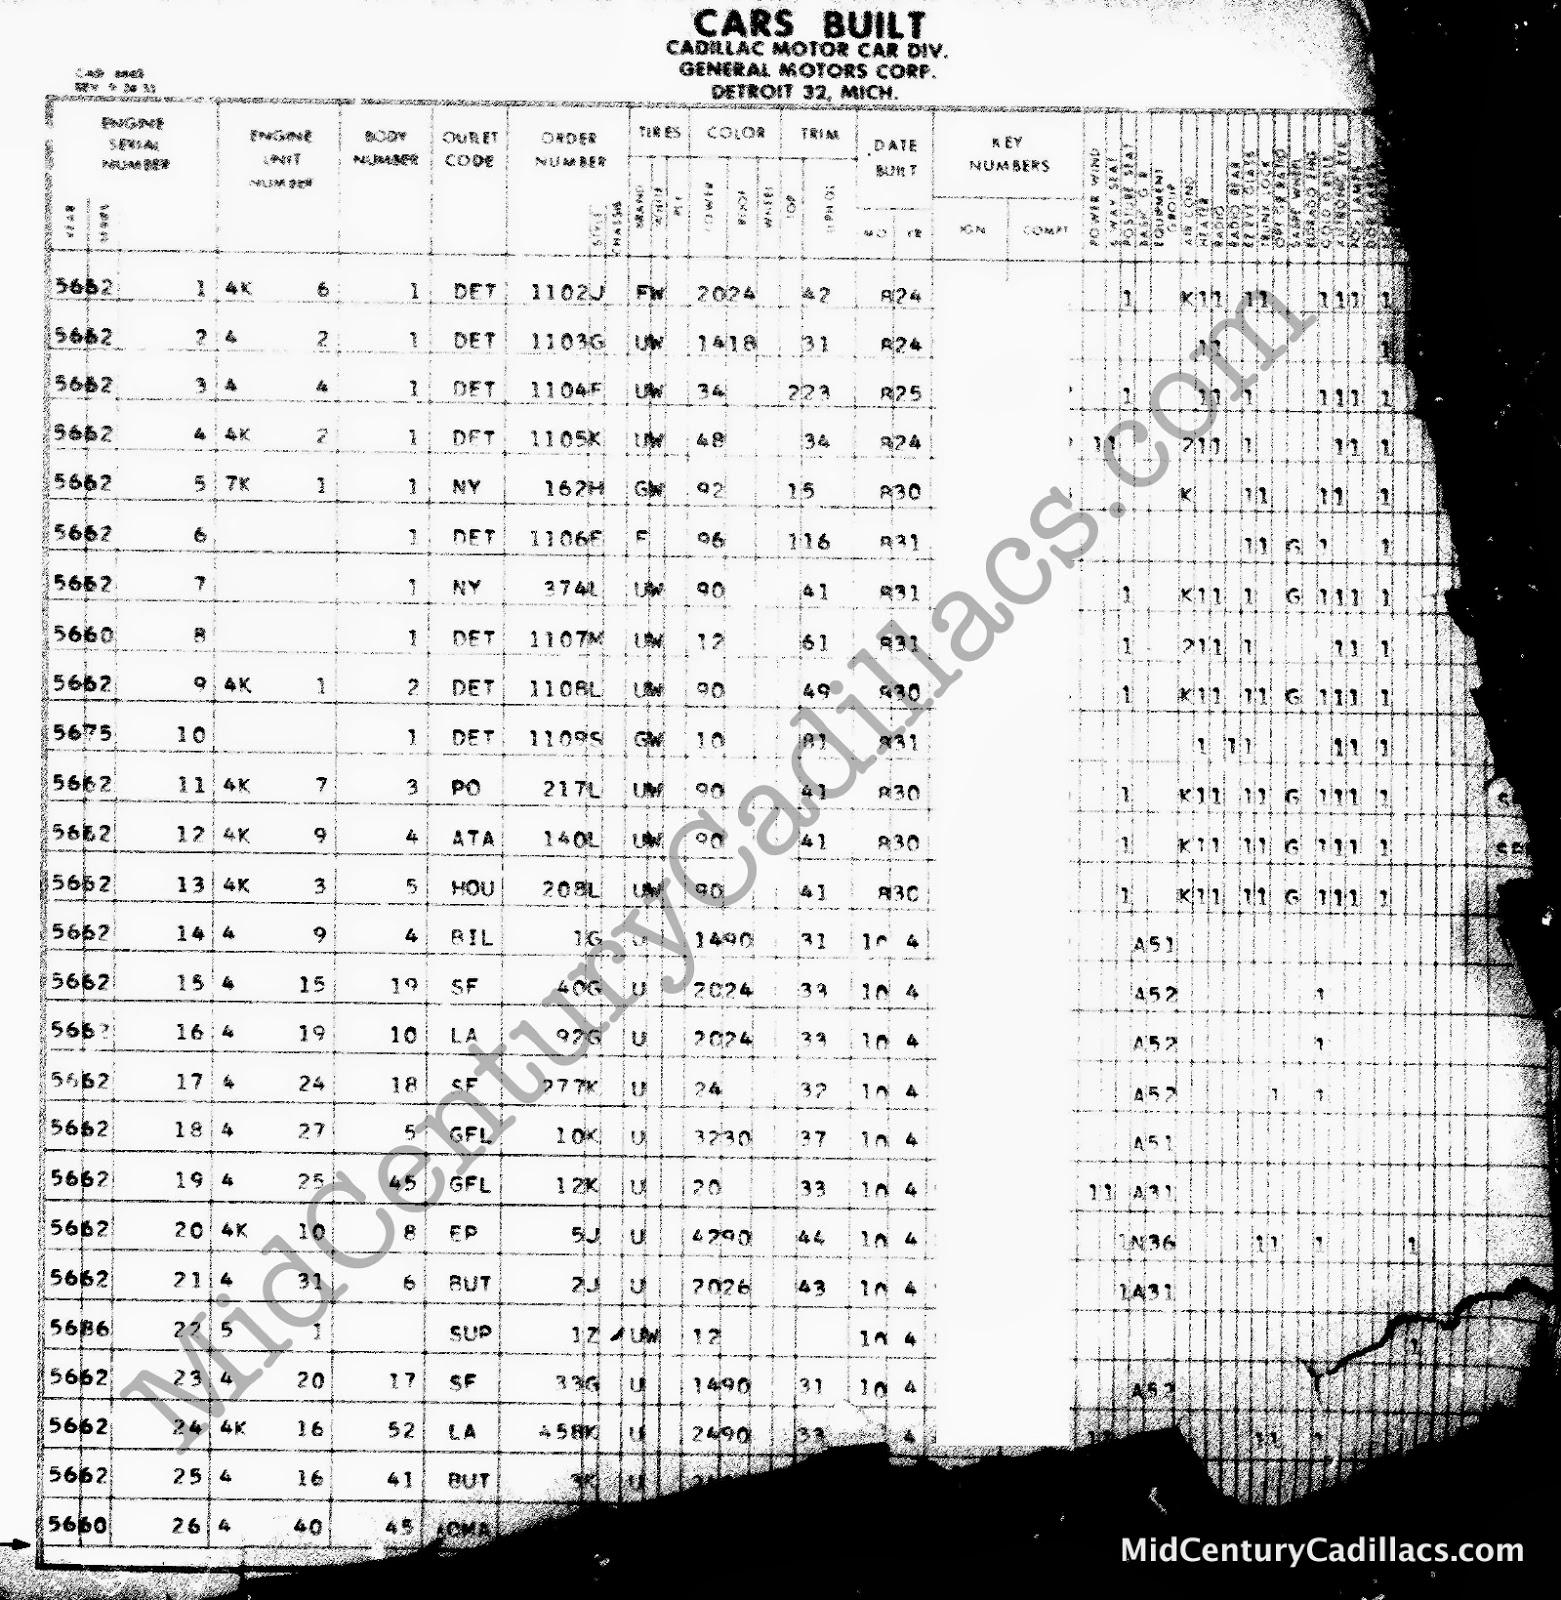 1956 eldorado biarritz survivor roster january 2012 1956 Cadillac Fleetwood click to enlarge